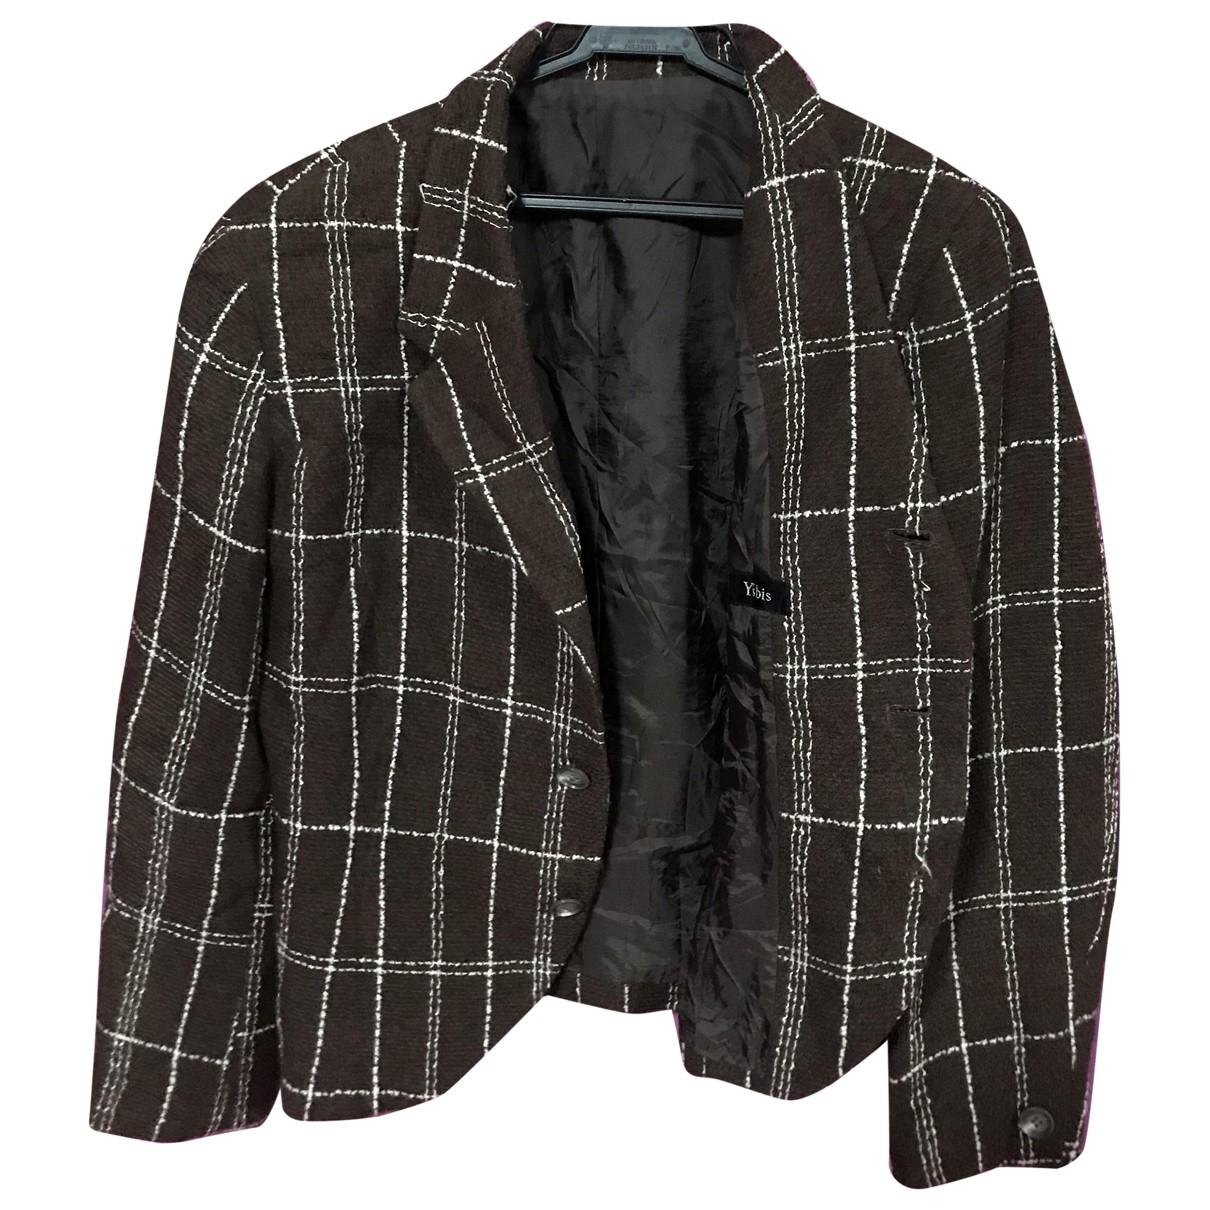 Yohji Yamamoto - Veste   pour femme en cachemire - marron